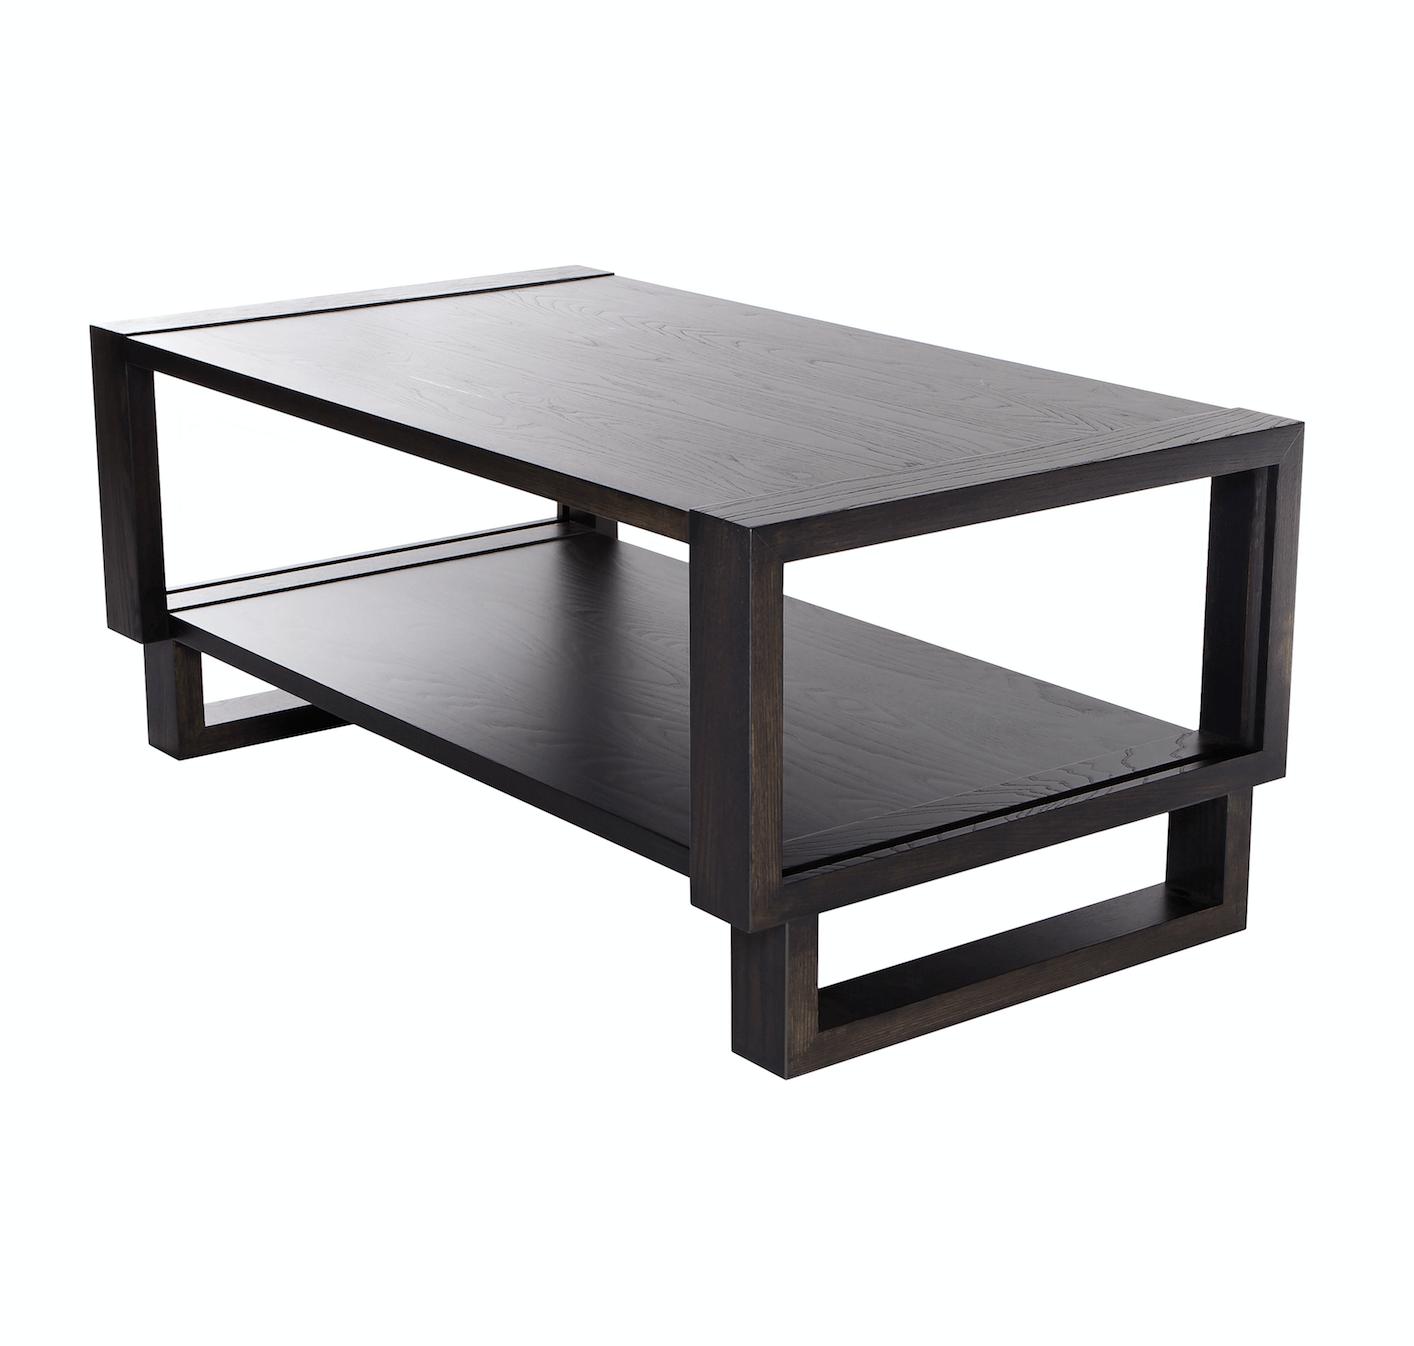 twist modern frame coffee table gray